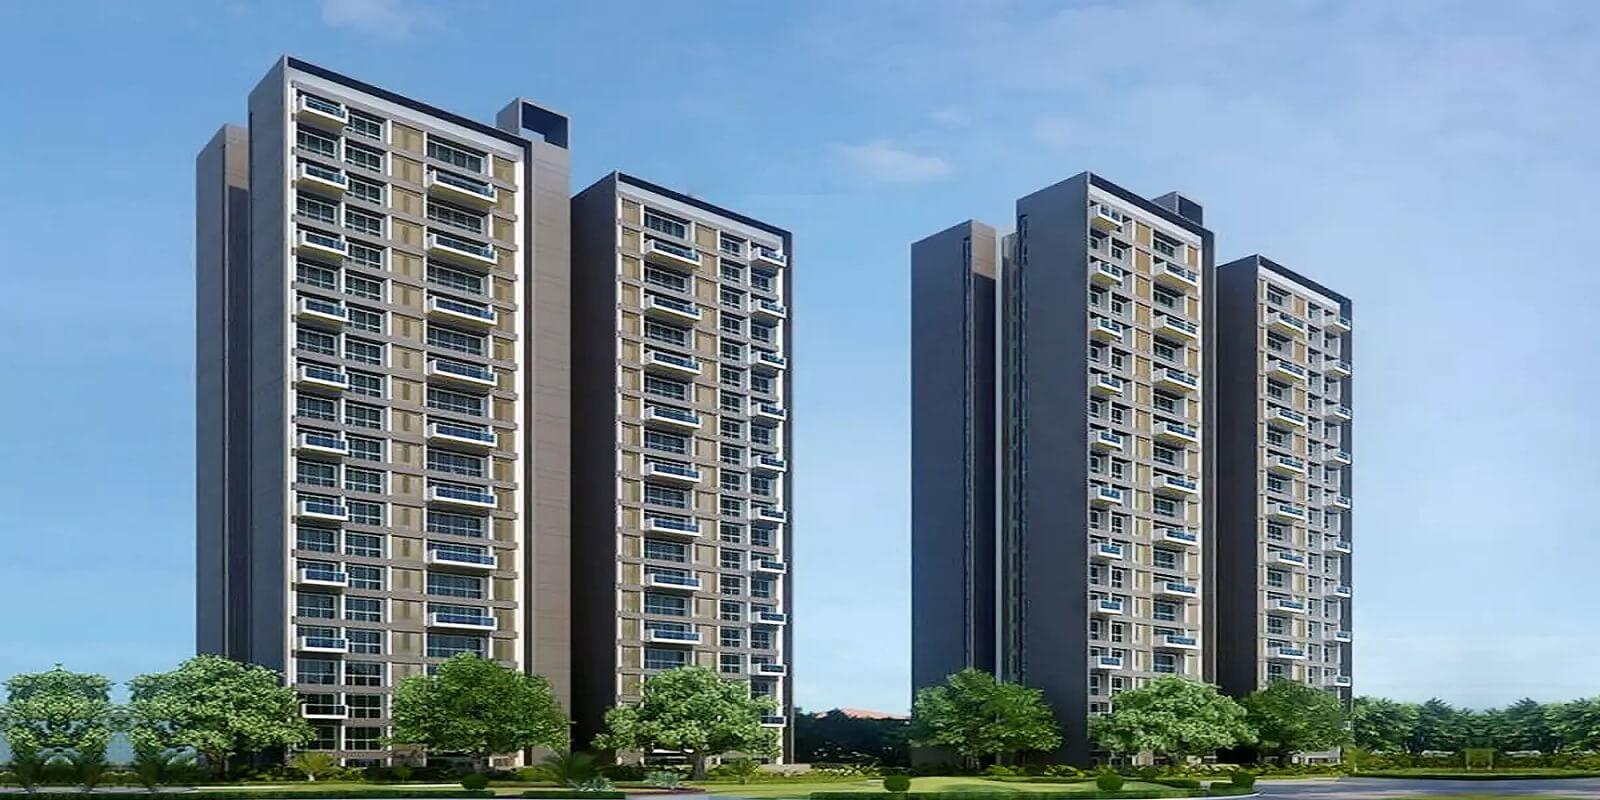 lodha belmondo tower 32 project large image21